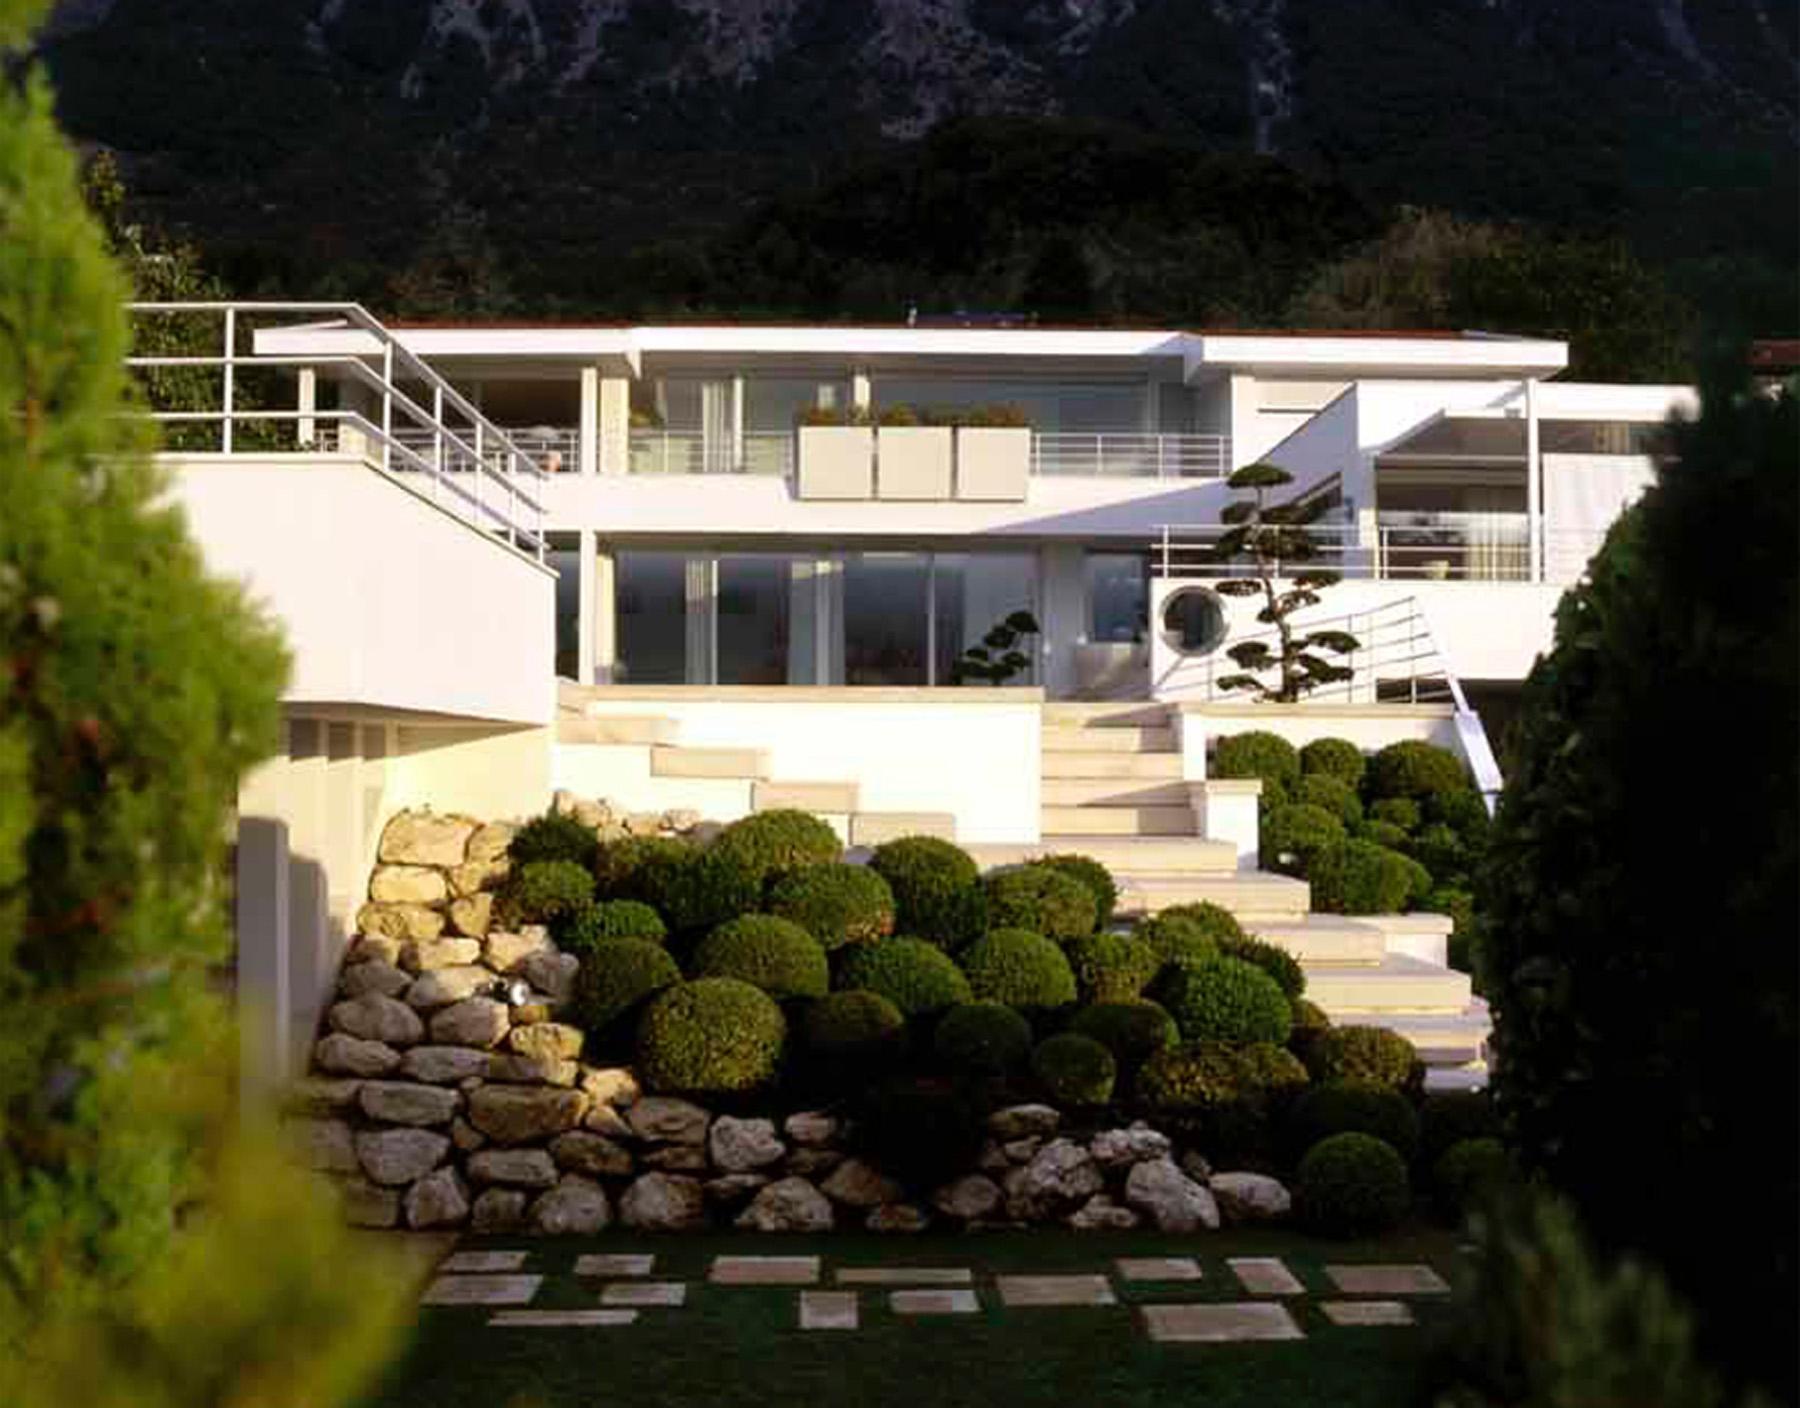 janik architecte maison individuelle meylan 2. Black Bedroom Furniture Sets. Home Design Ideas